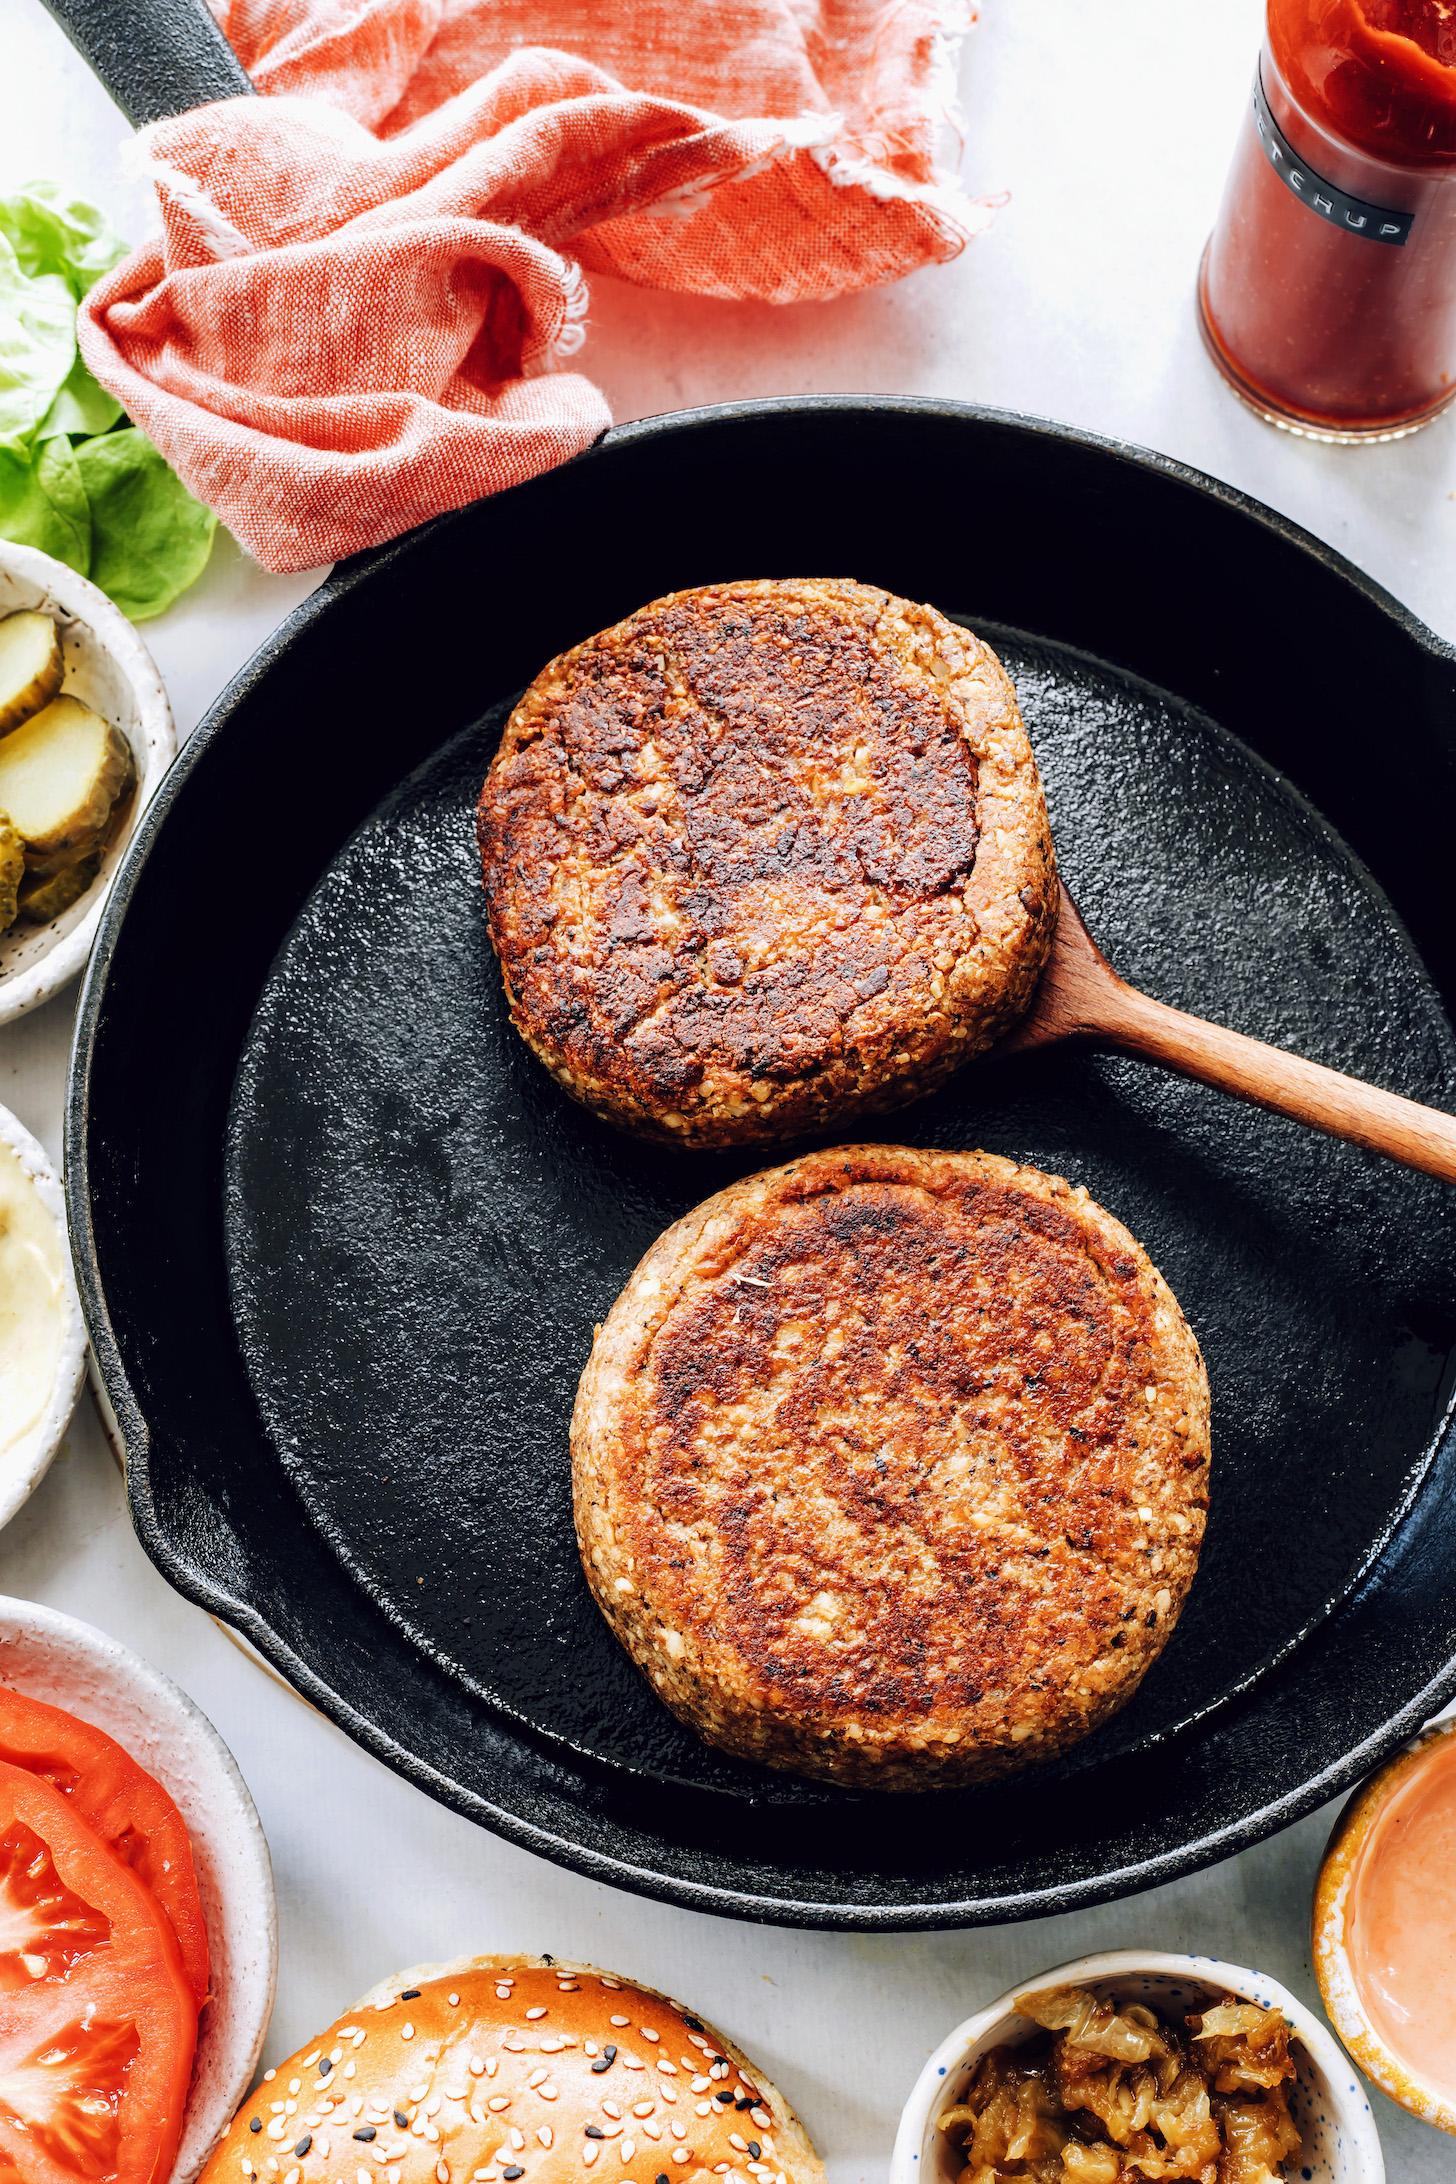 Cooking gluten-free vegan burger patties in a cast iron skillet